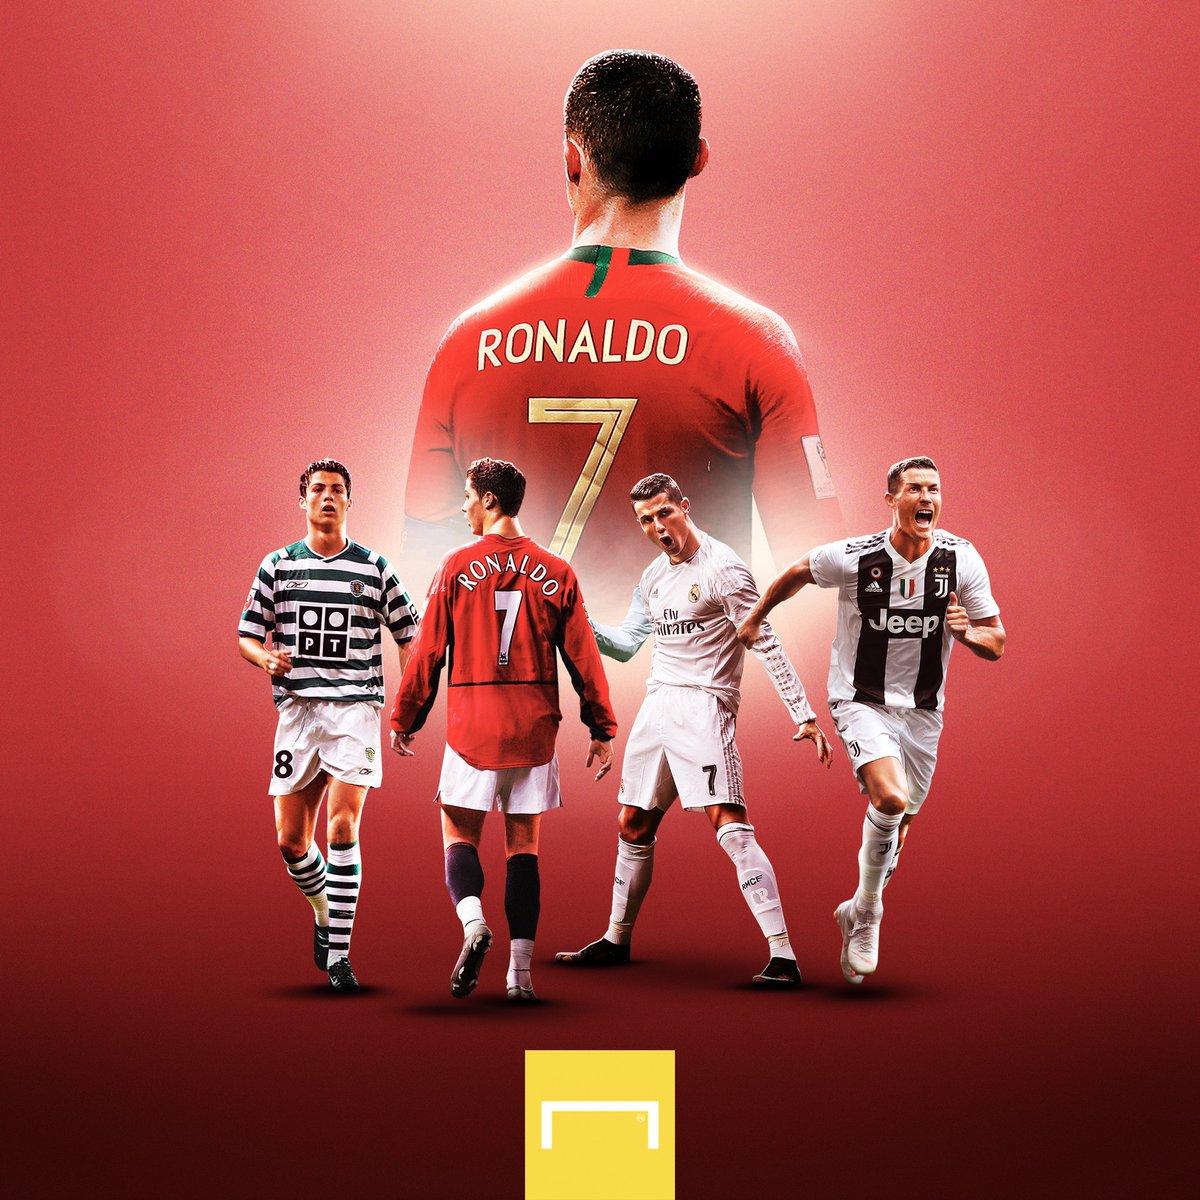 ✅ 2002 ✅ 2003 ✅ 2004 ✅ 2005 ✅ 2006 ✅ 2007 ✅ 2008 ✅ 2009 ✅ 2010 ✅ 2011 ✅ 2012 ✅ 2013 ✅ 2014 ✅ 2015 ✅ 2016 ✅ 2017 ✅ 2018 ✅ 2019 ✅ 2020 ✅ 2021  Cristiano Ronaldo has now scored in 20 consecutive years 🤴